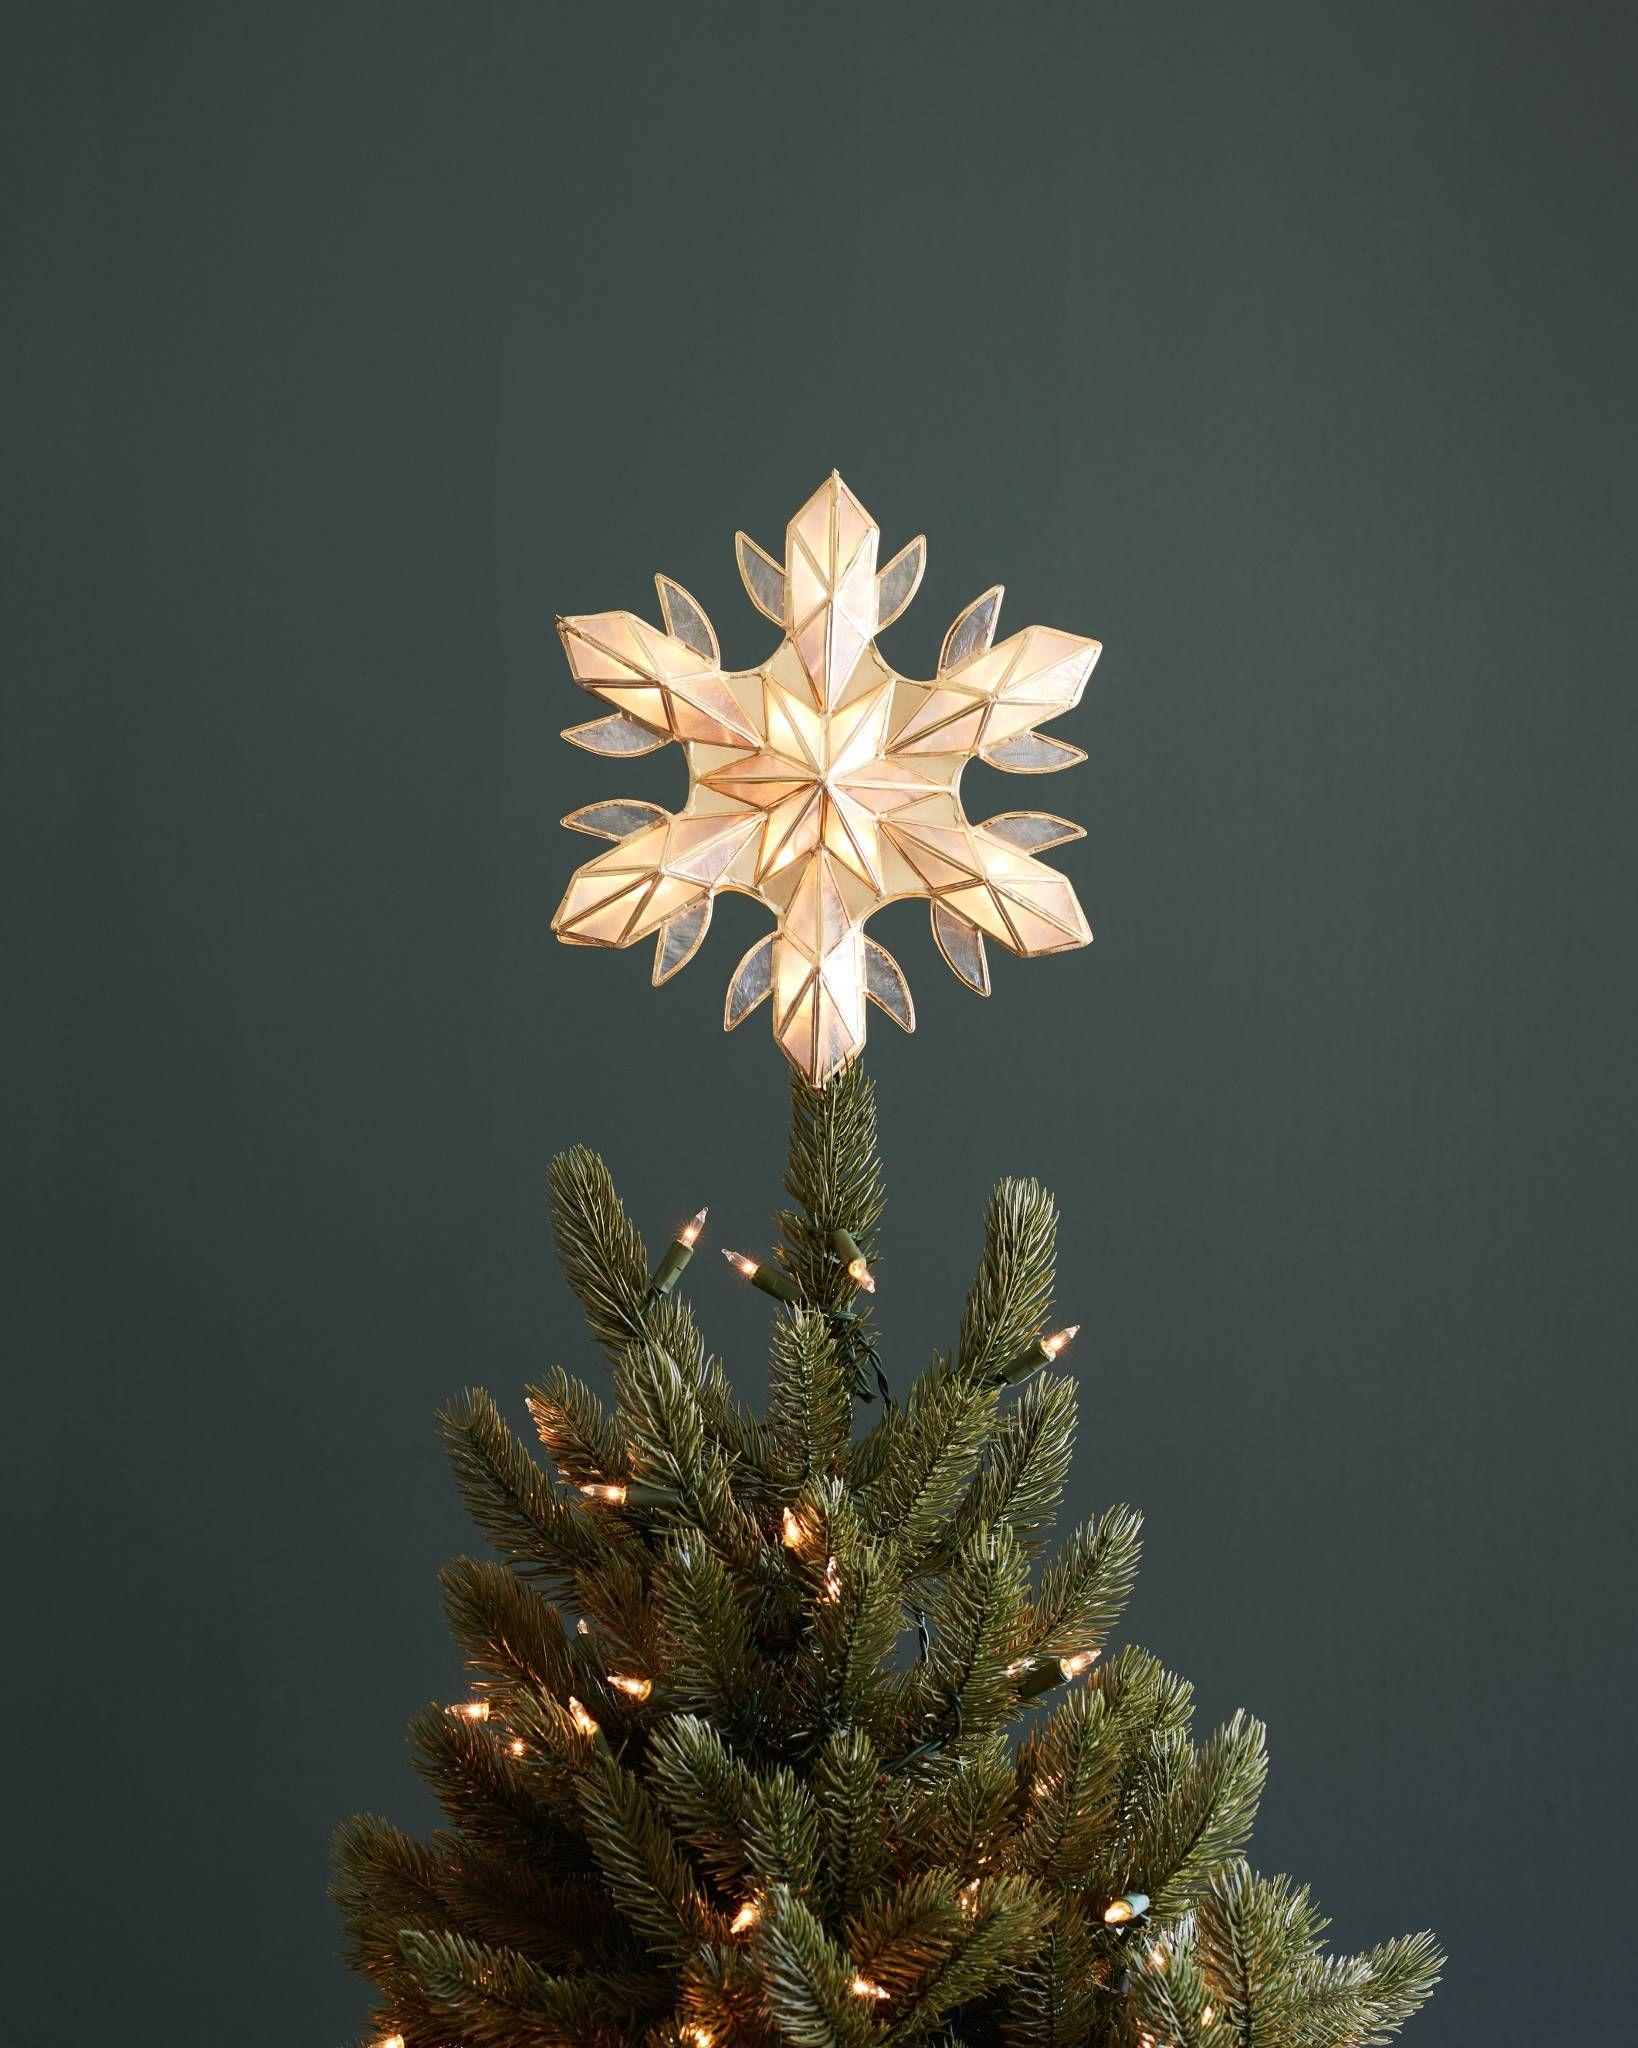 Capiz Snowflake Lighted Christmas Tree Topper Balsam Hill Christmas Tree Toppers Lighted Lighted Tree Topper Snowflake Lights